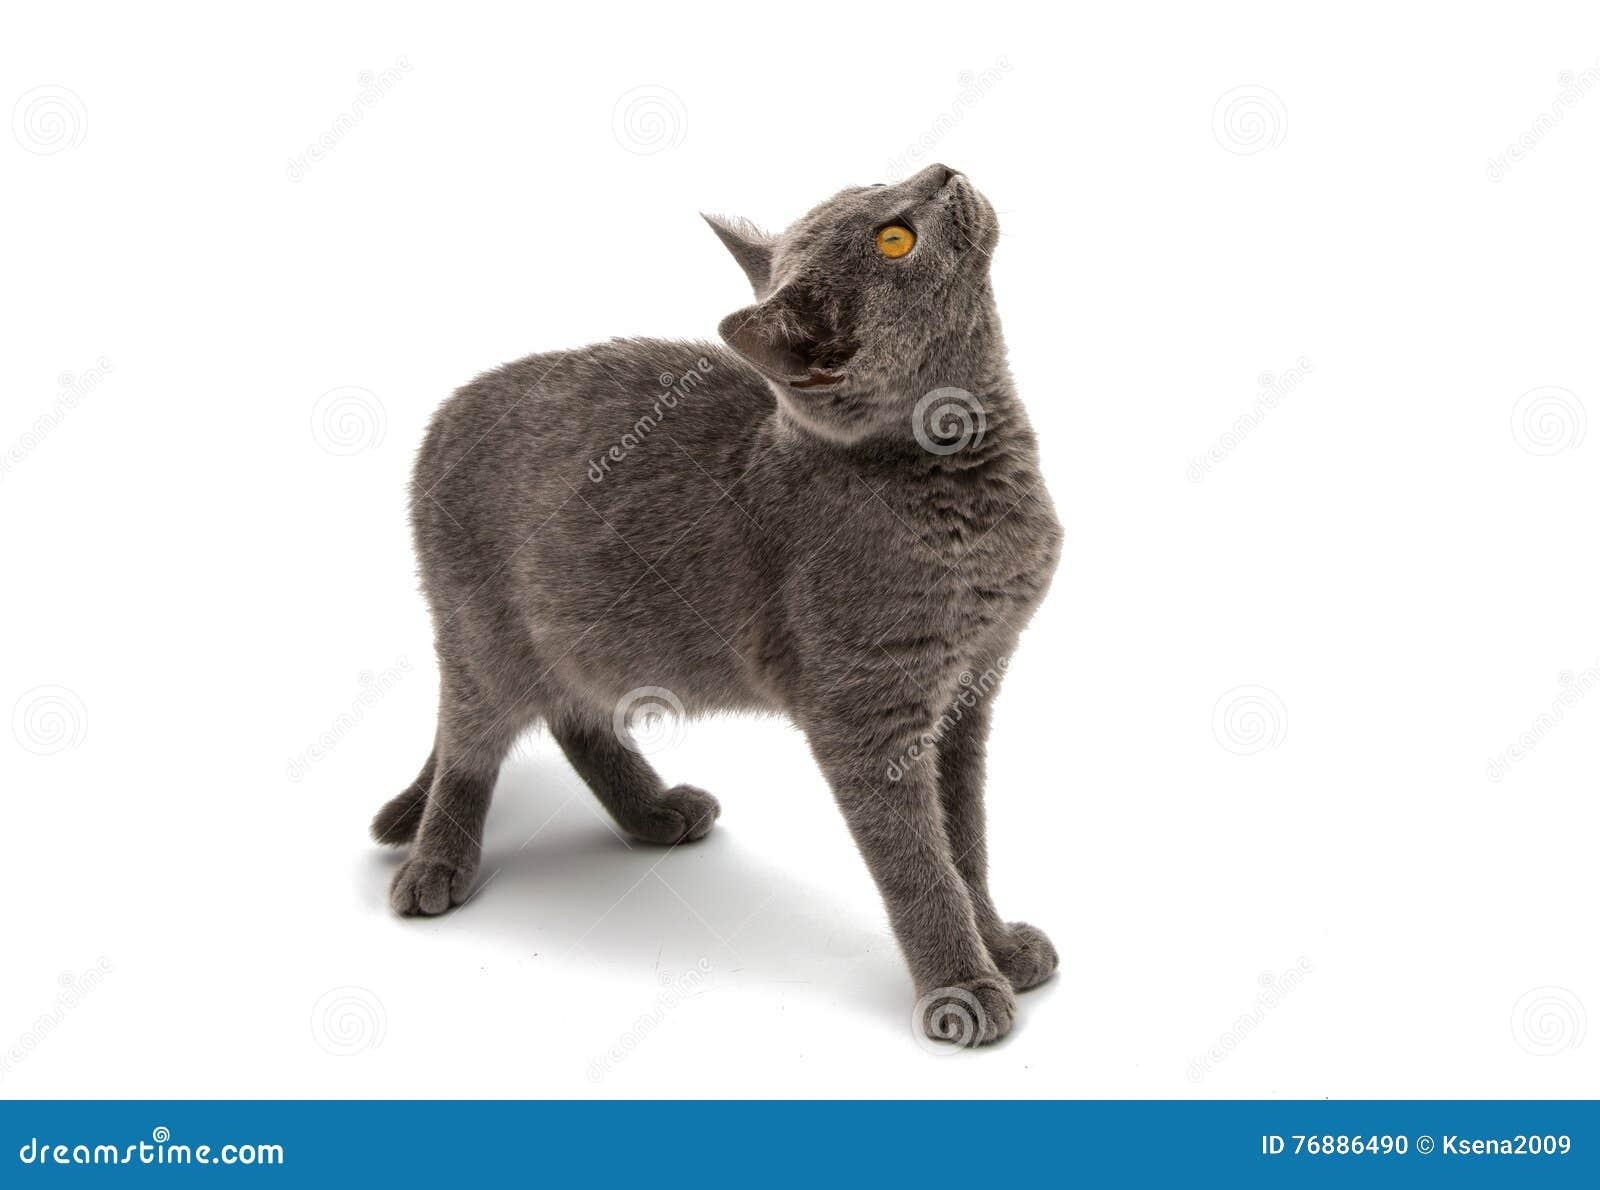 Gato britanico de pelo corto azul